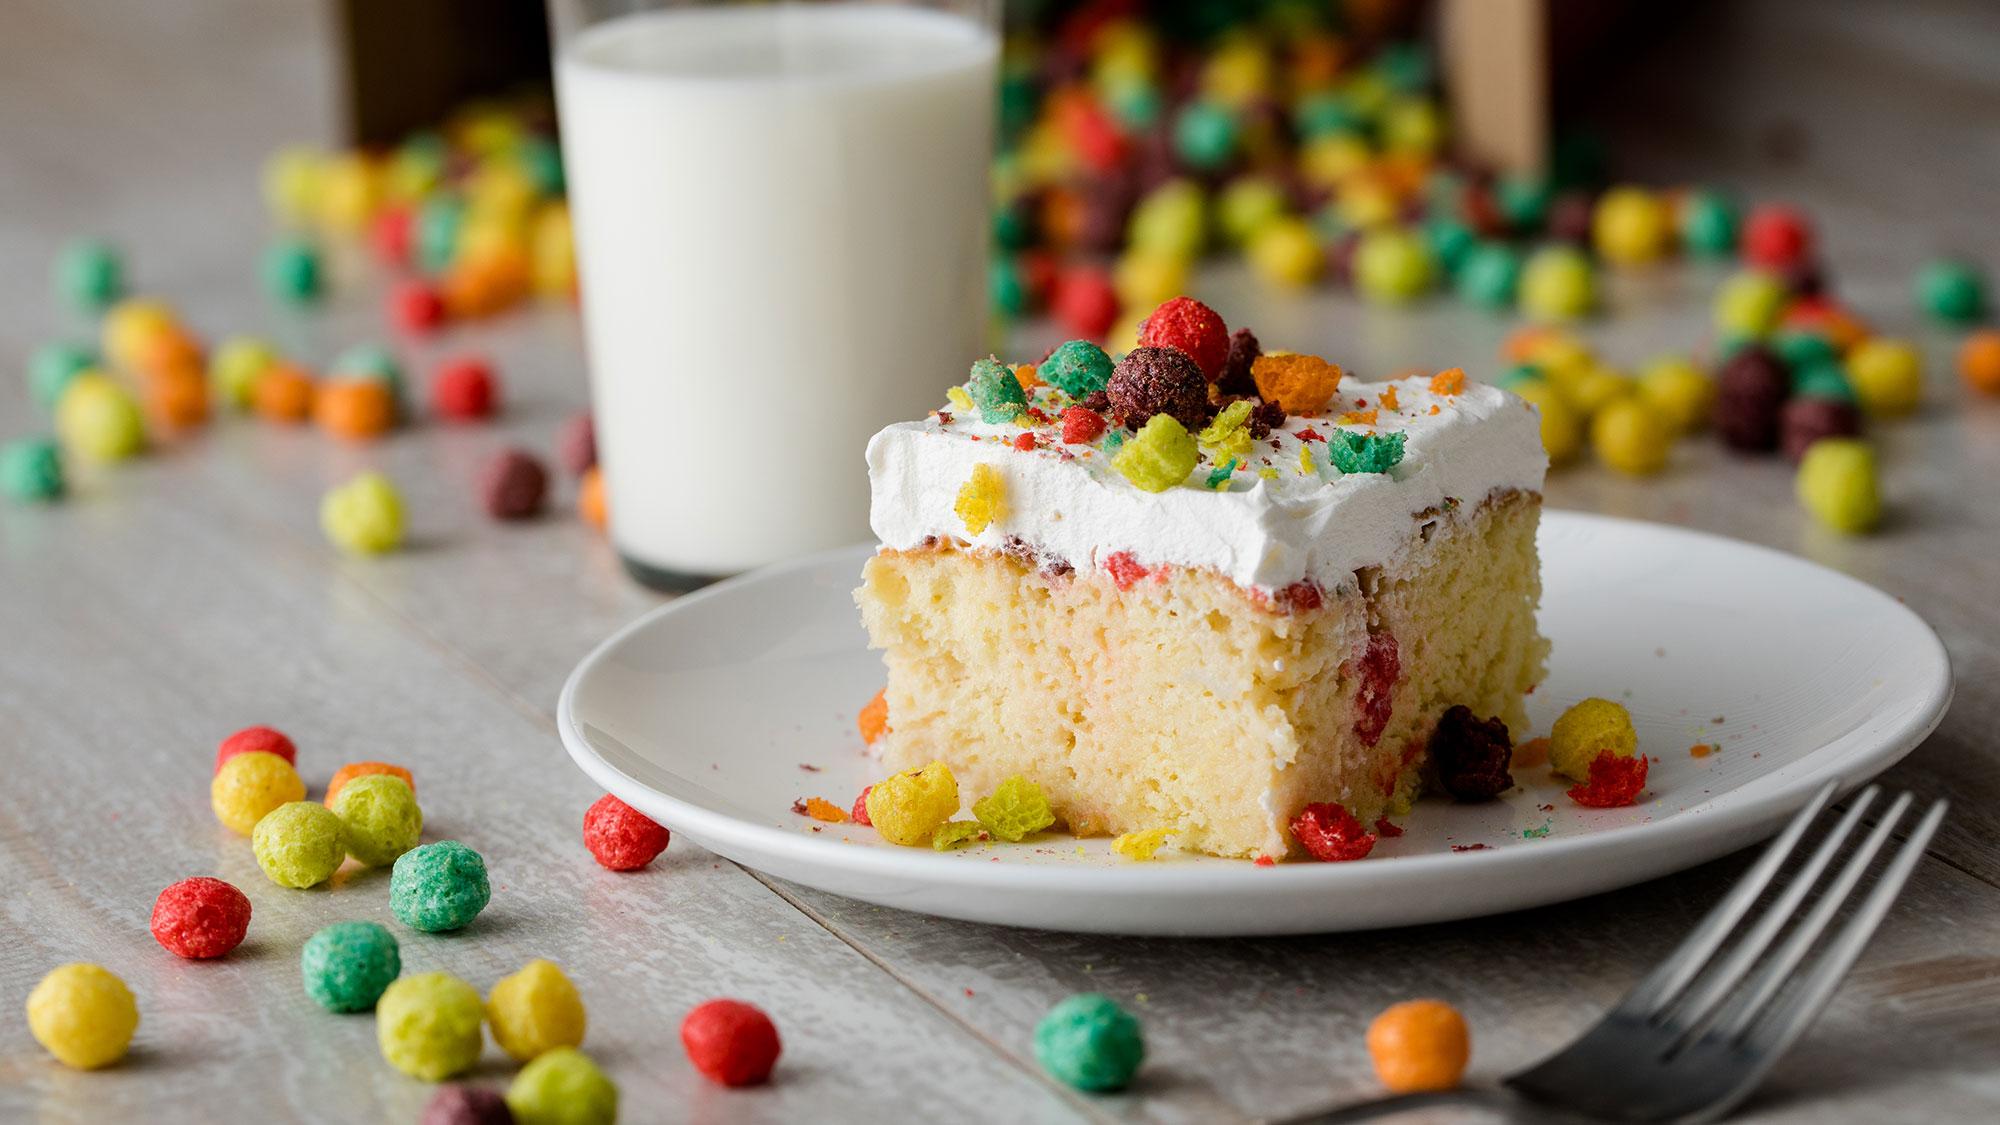 Cereal-Milk-Tres-Leche-Cake-2000x1125.jpg